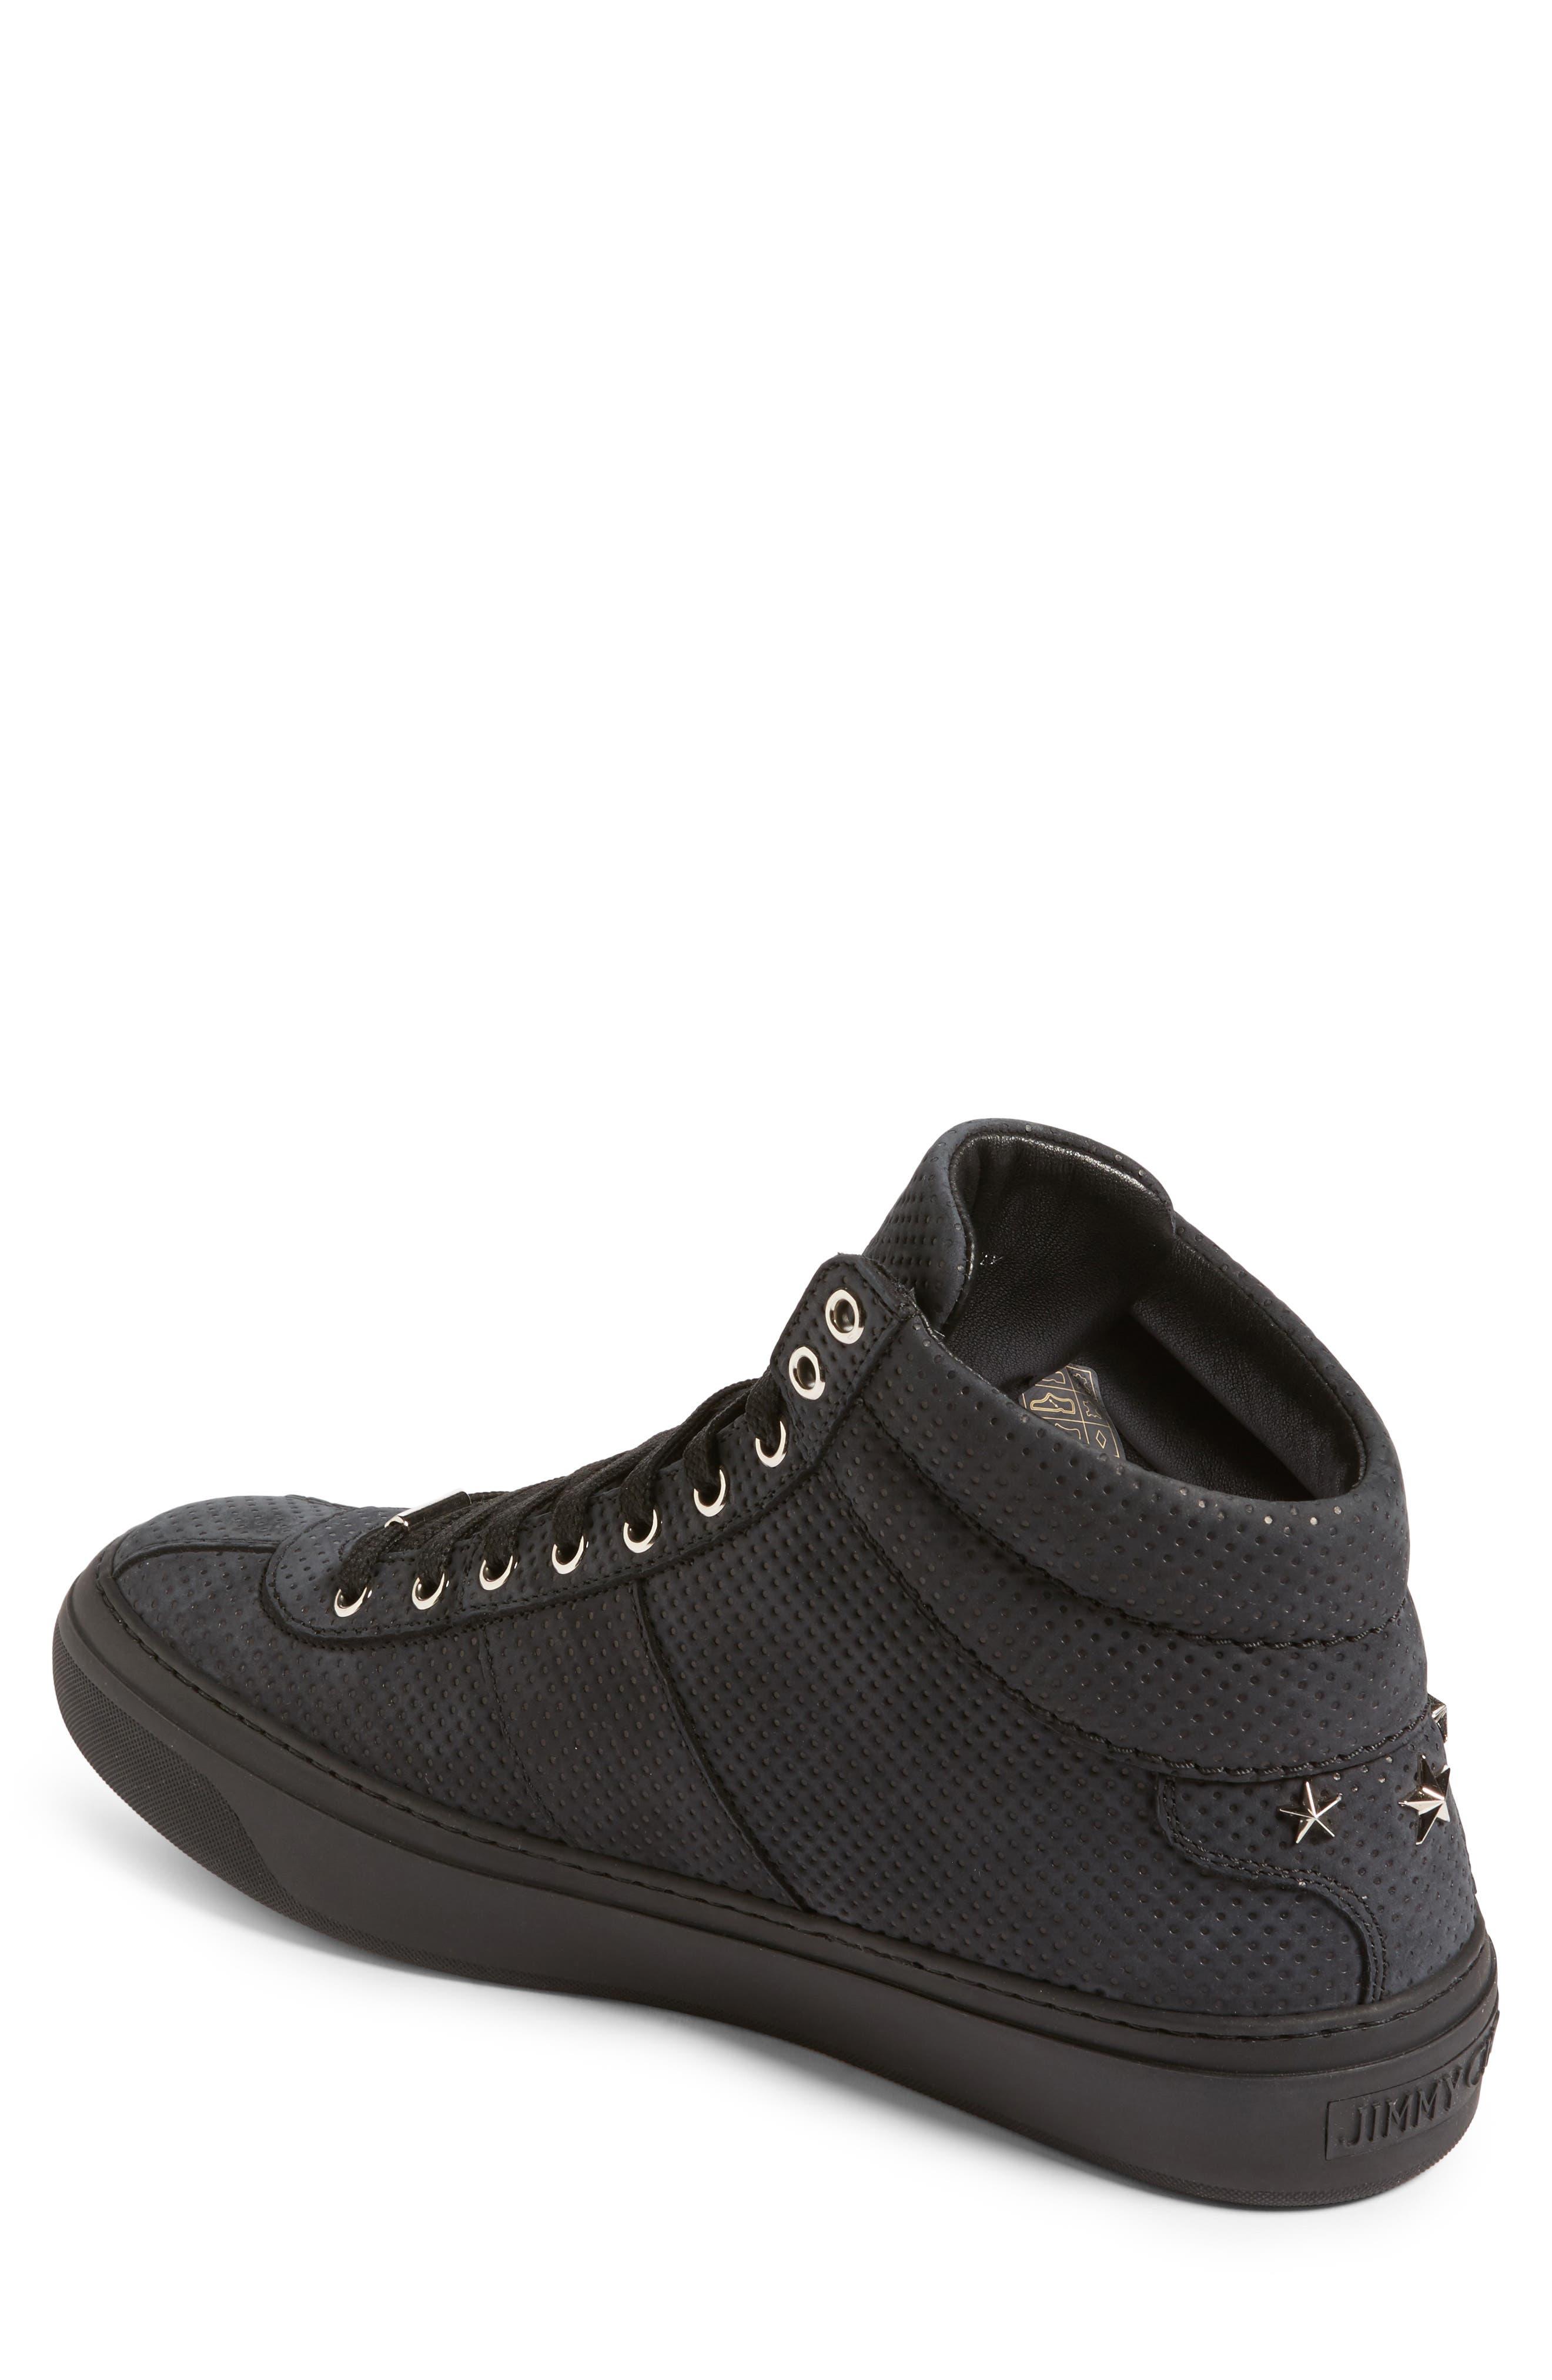 Belgravi Sneaker,                             Alternate thumbnail 2, color,                             Black/ Steel